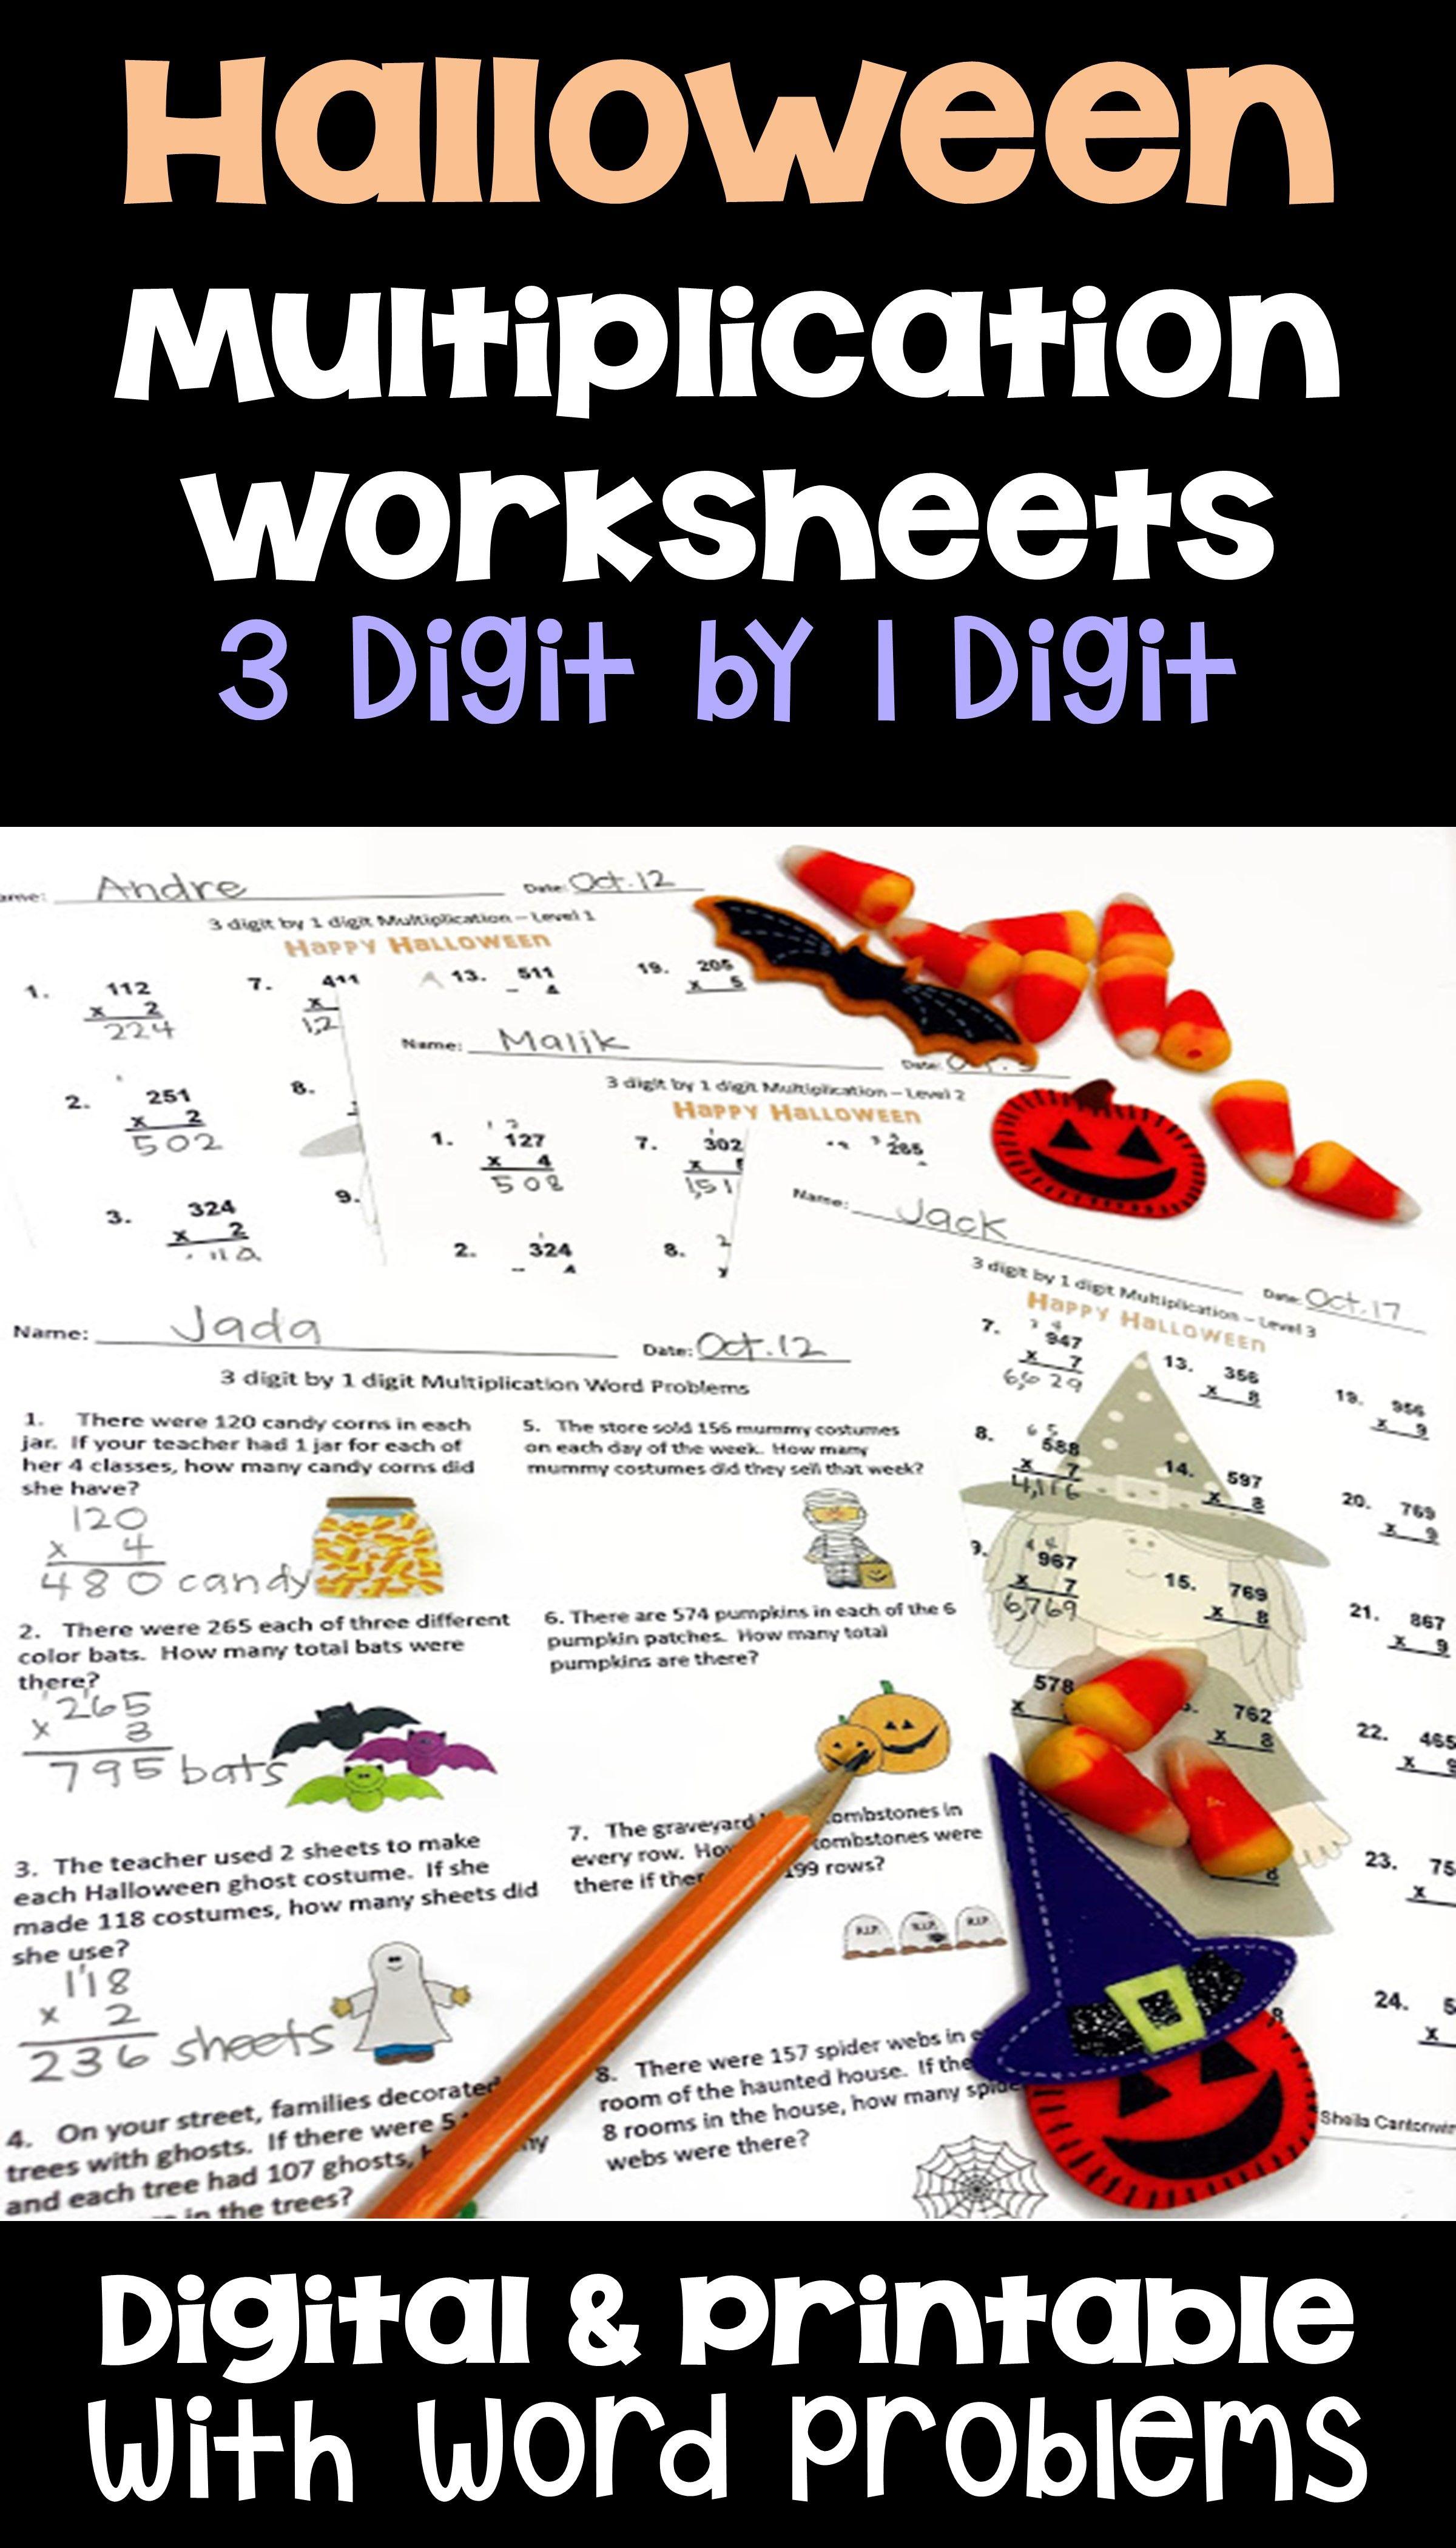 Halloween 3 Digit Multiplication Worksheets With Digital Printable Options Word Problems Halloween Math Halloween Math Activities Fun Halloween Math [ 4200 x 2400 Pixel ]